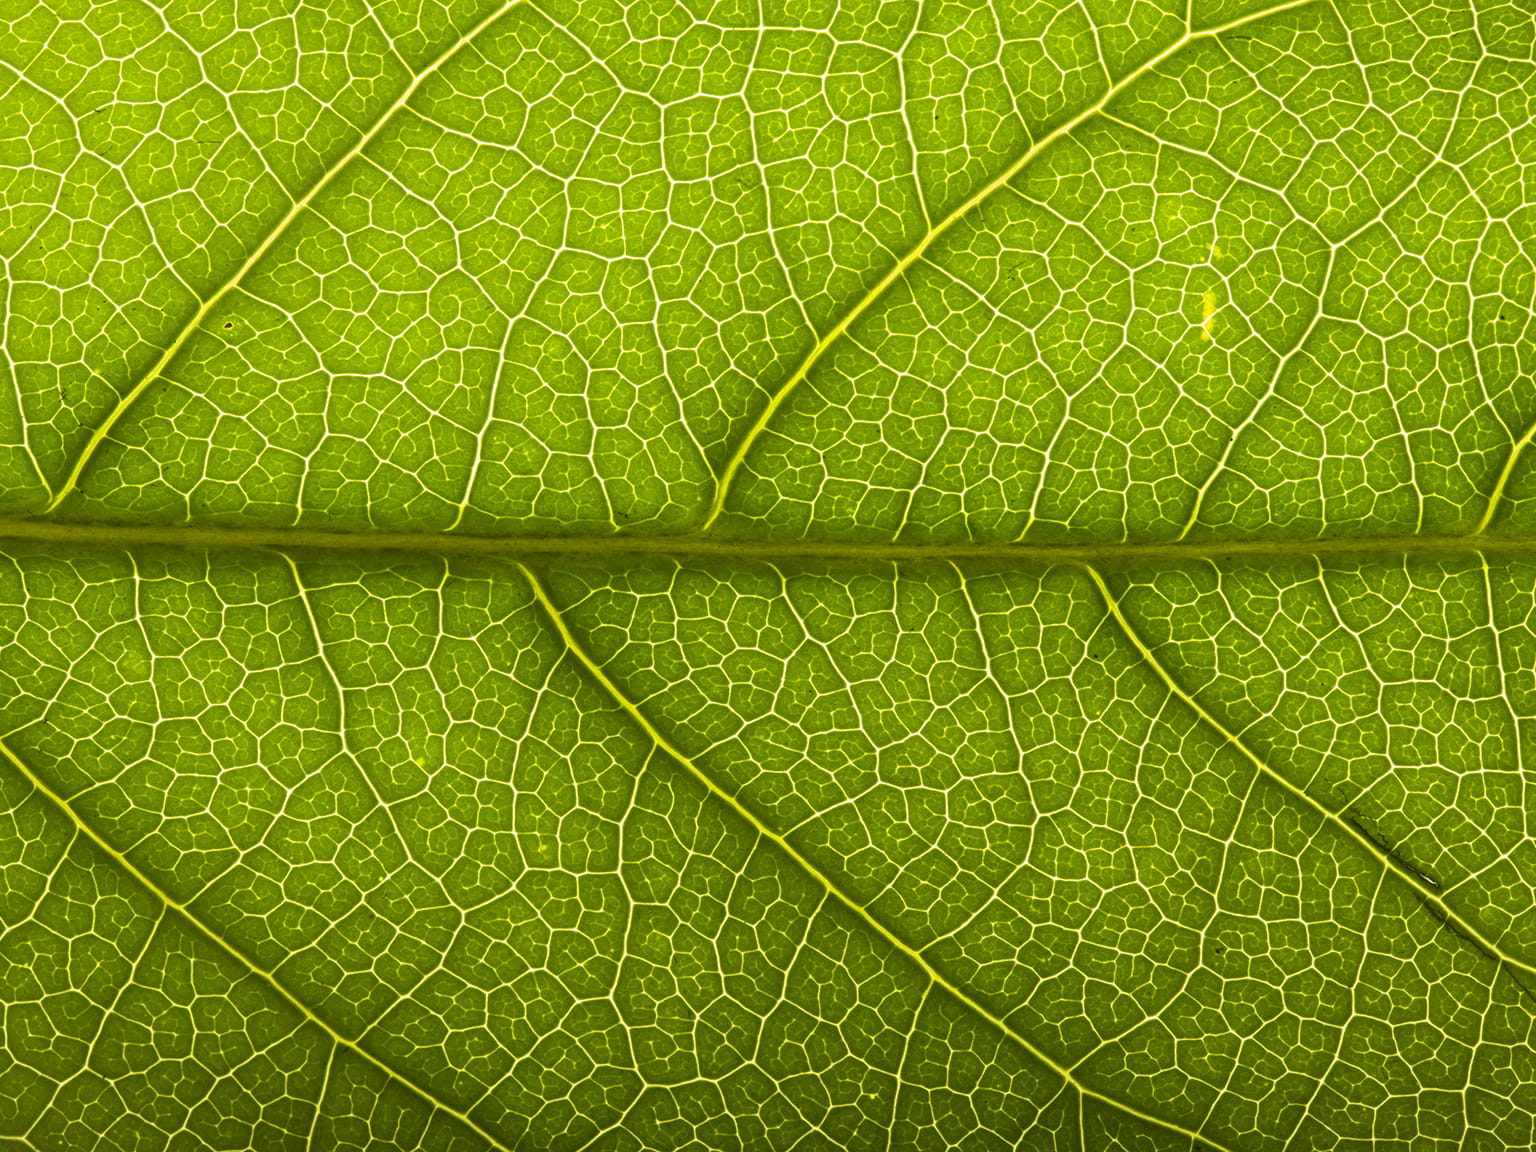 Grønt blad close-up